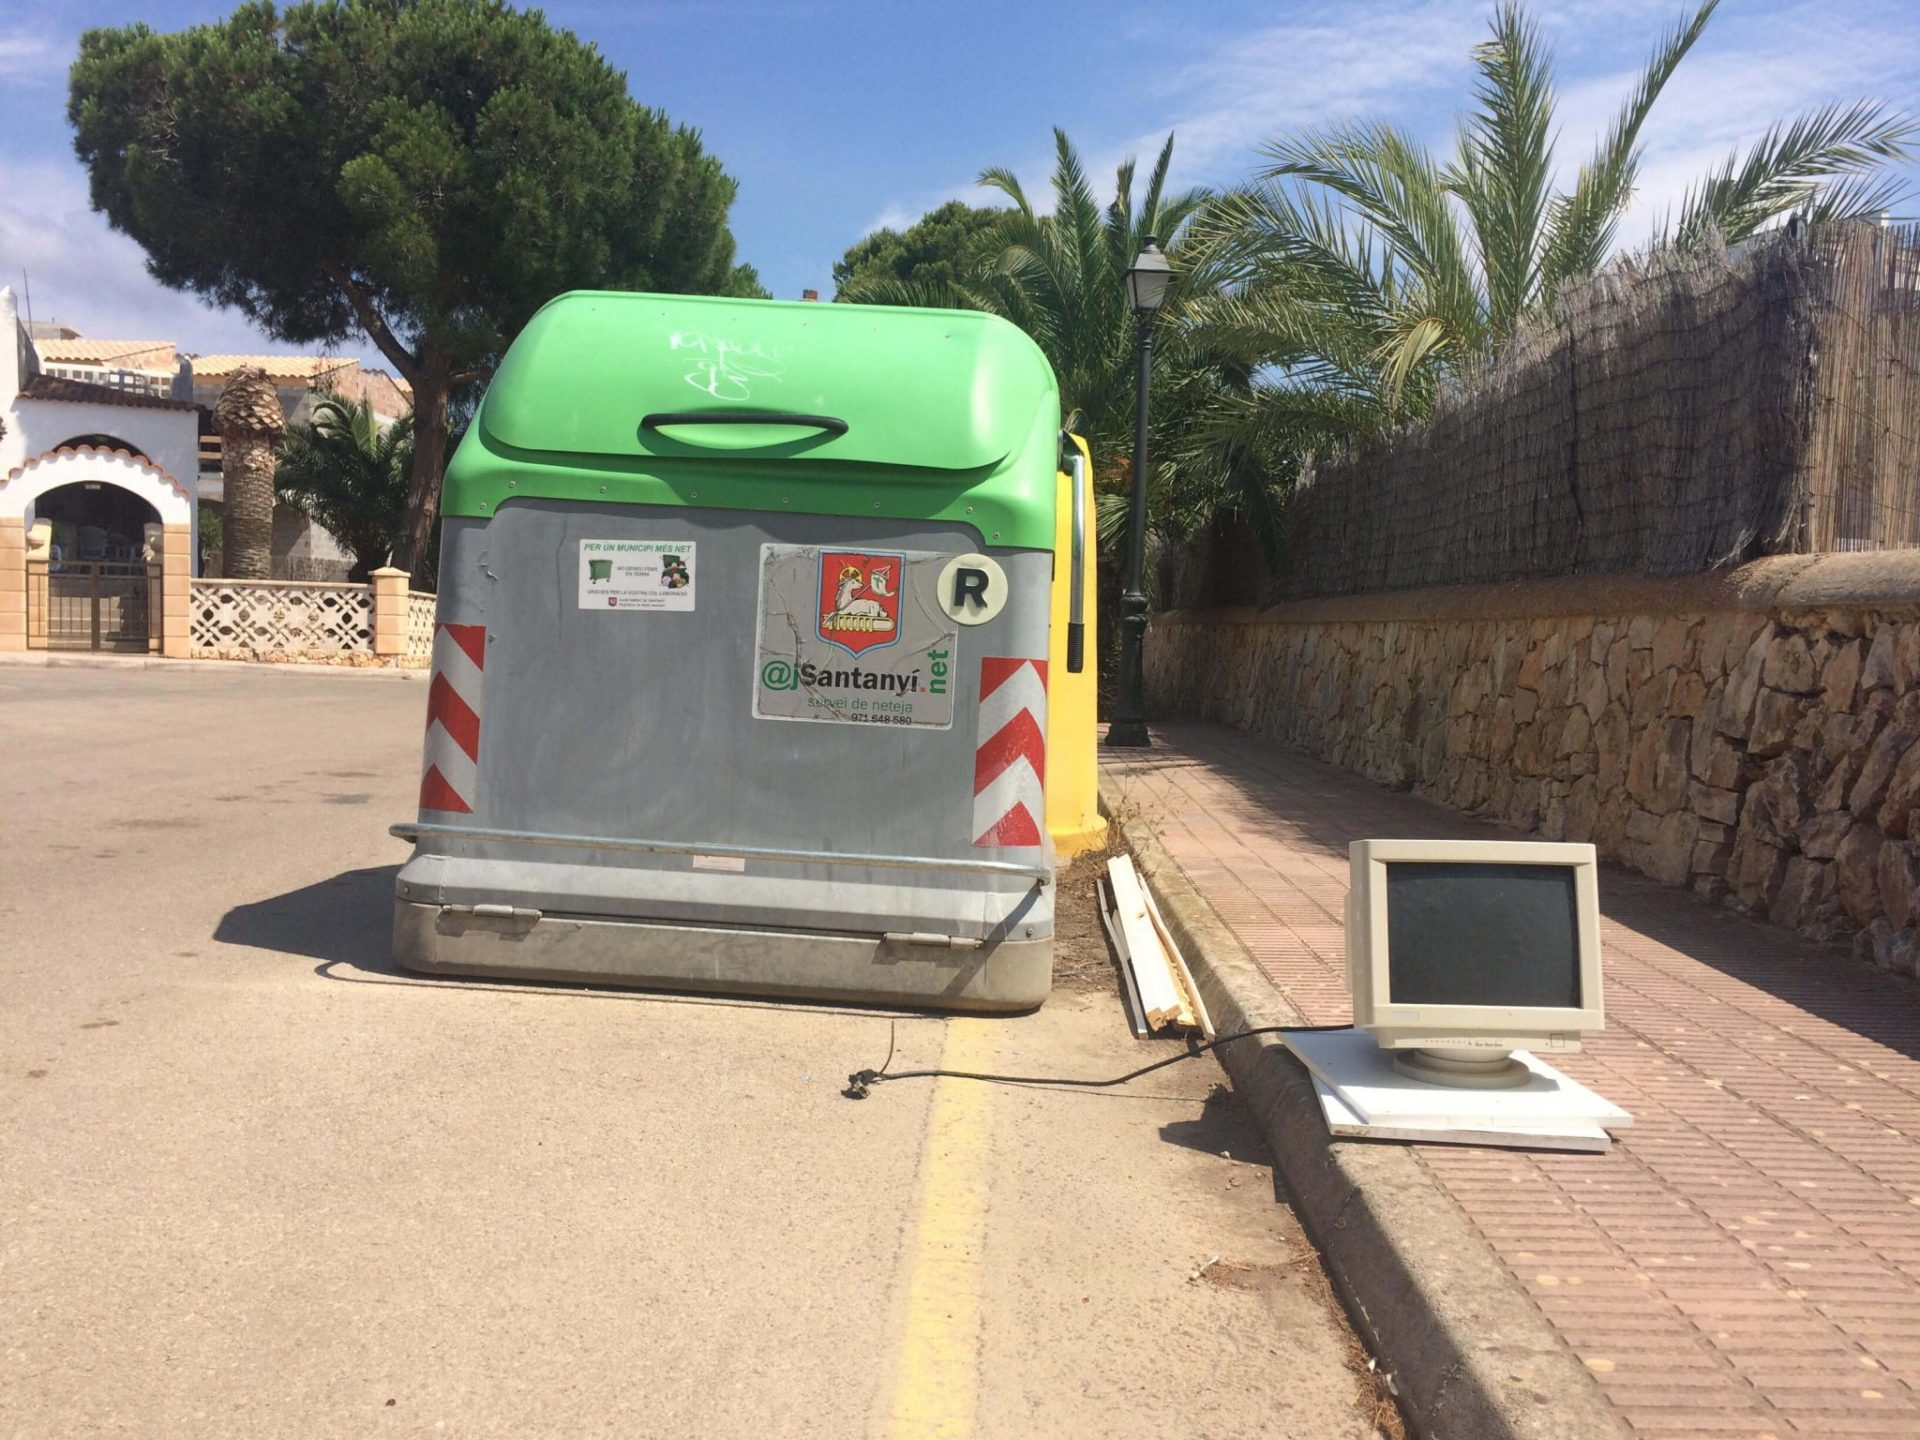 barcelona_spanelsko_trideni_elektronika_pocitac_elektroodpad